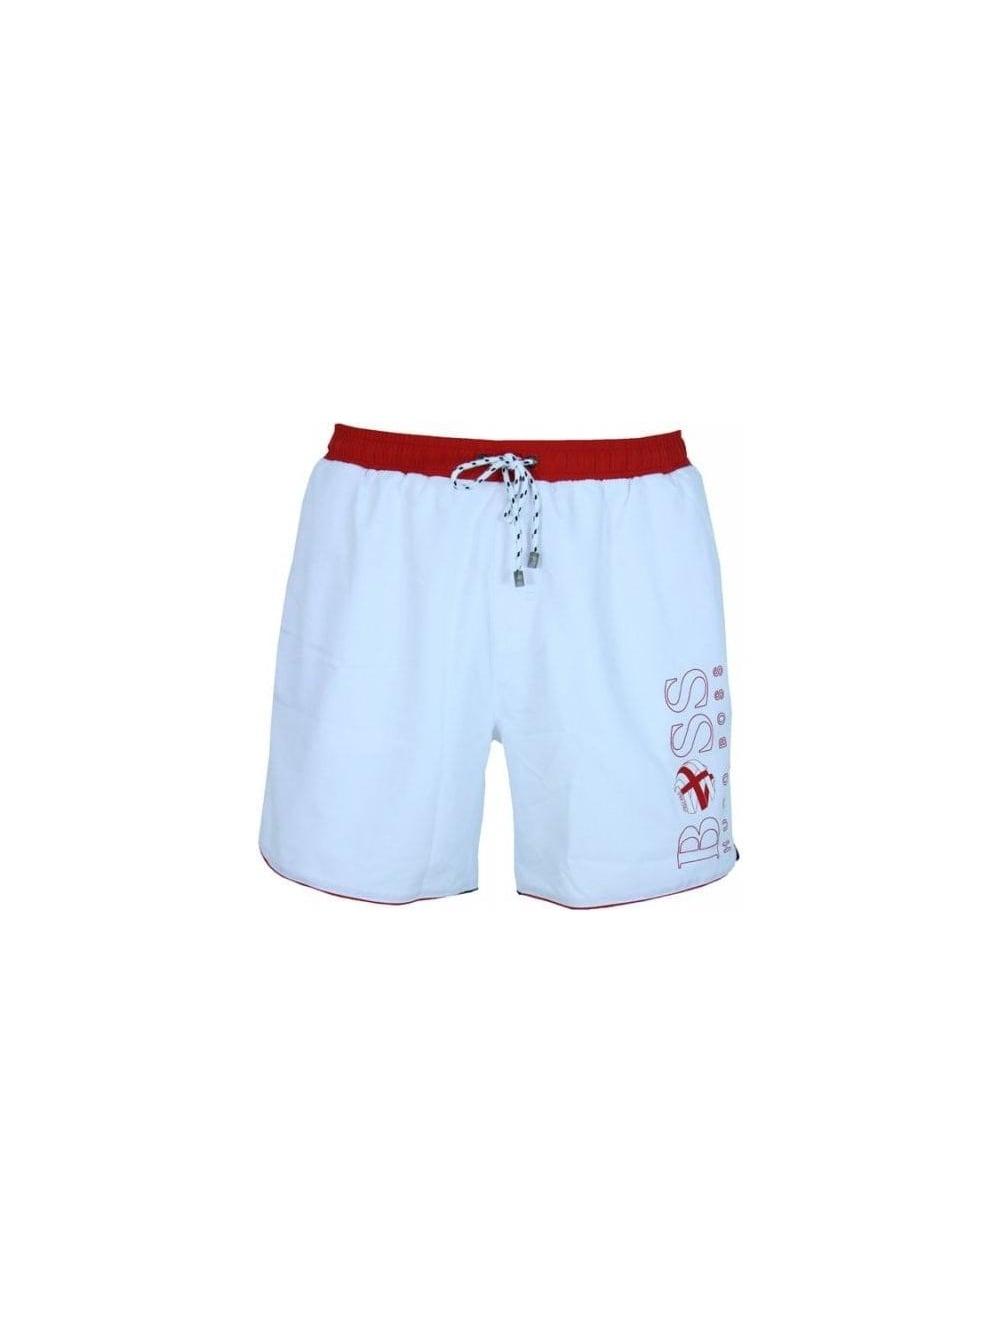 61082971d2 Boss Black Footballfish Swimming Shorts in Open White - Northern Threads